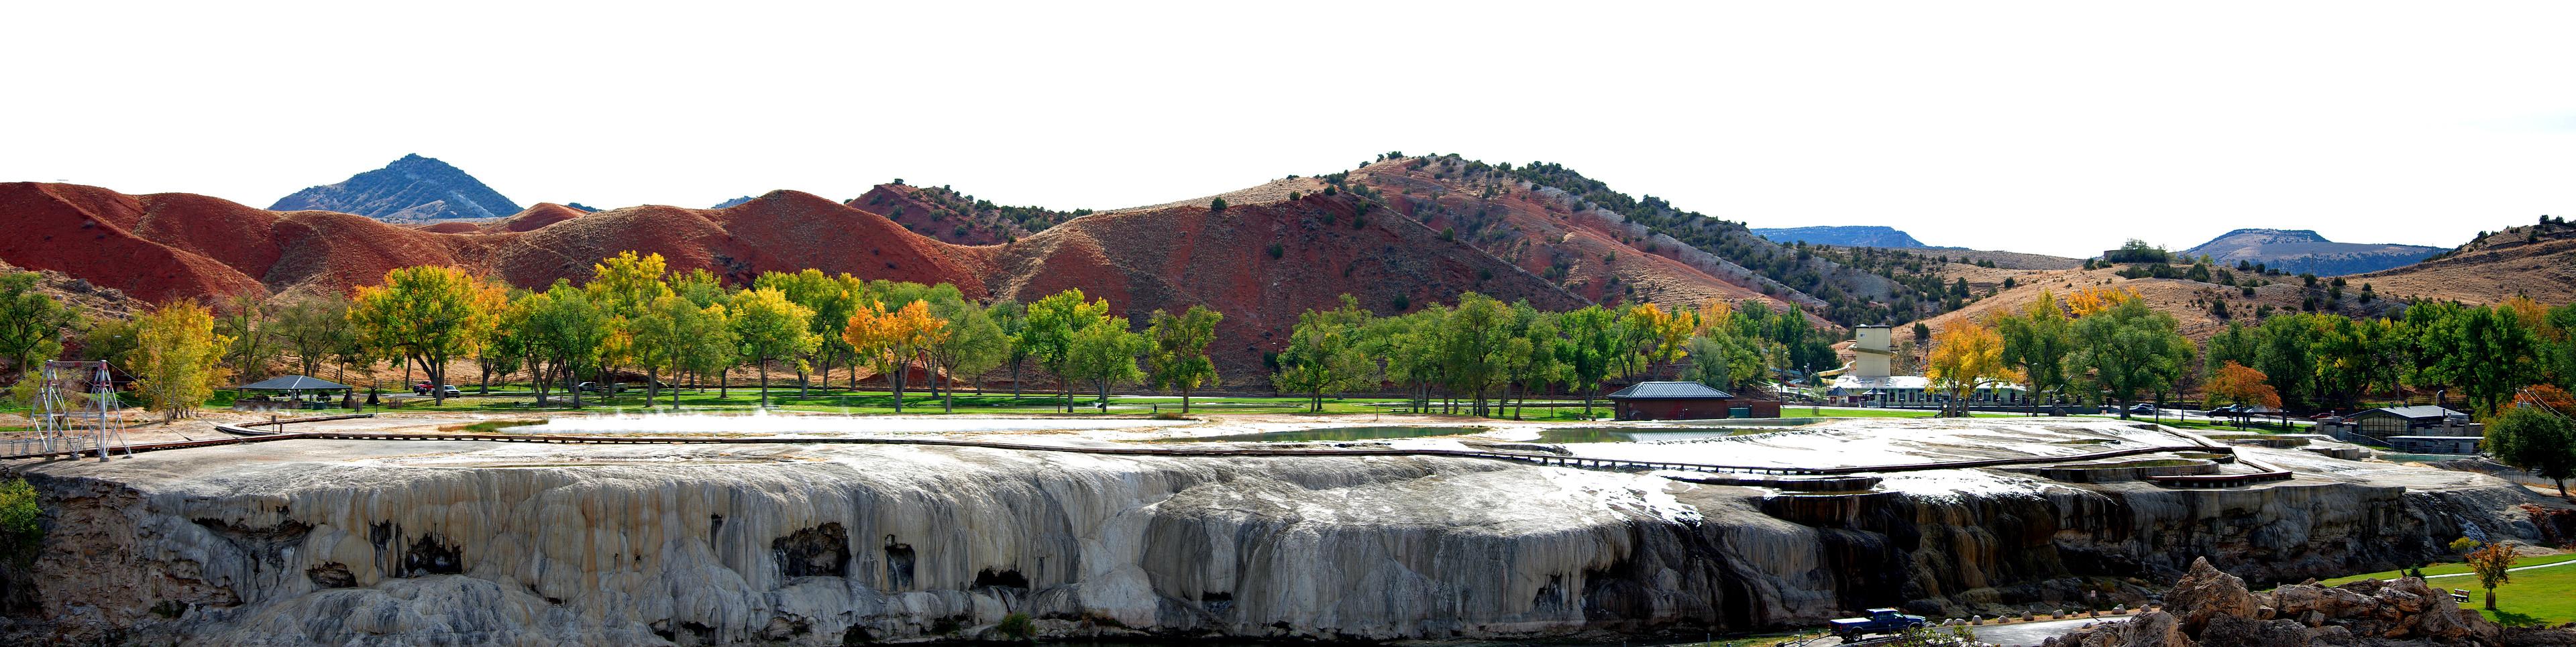 Thermopolis Hot Springs